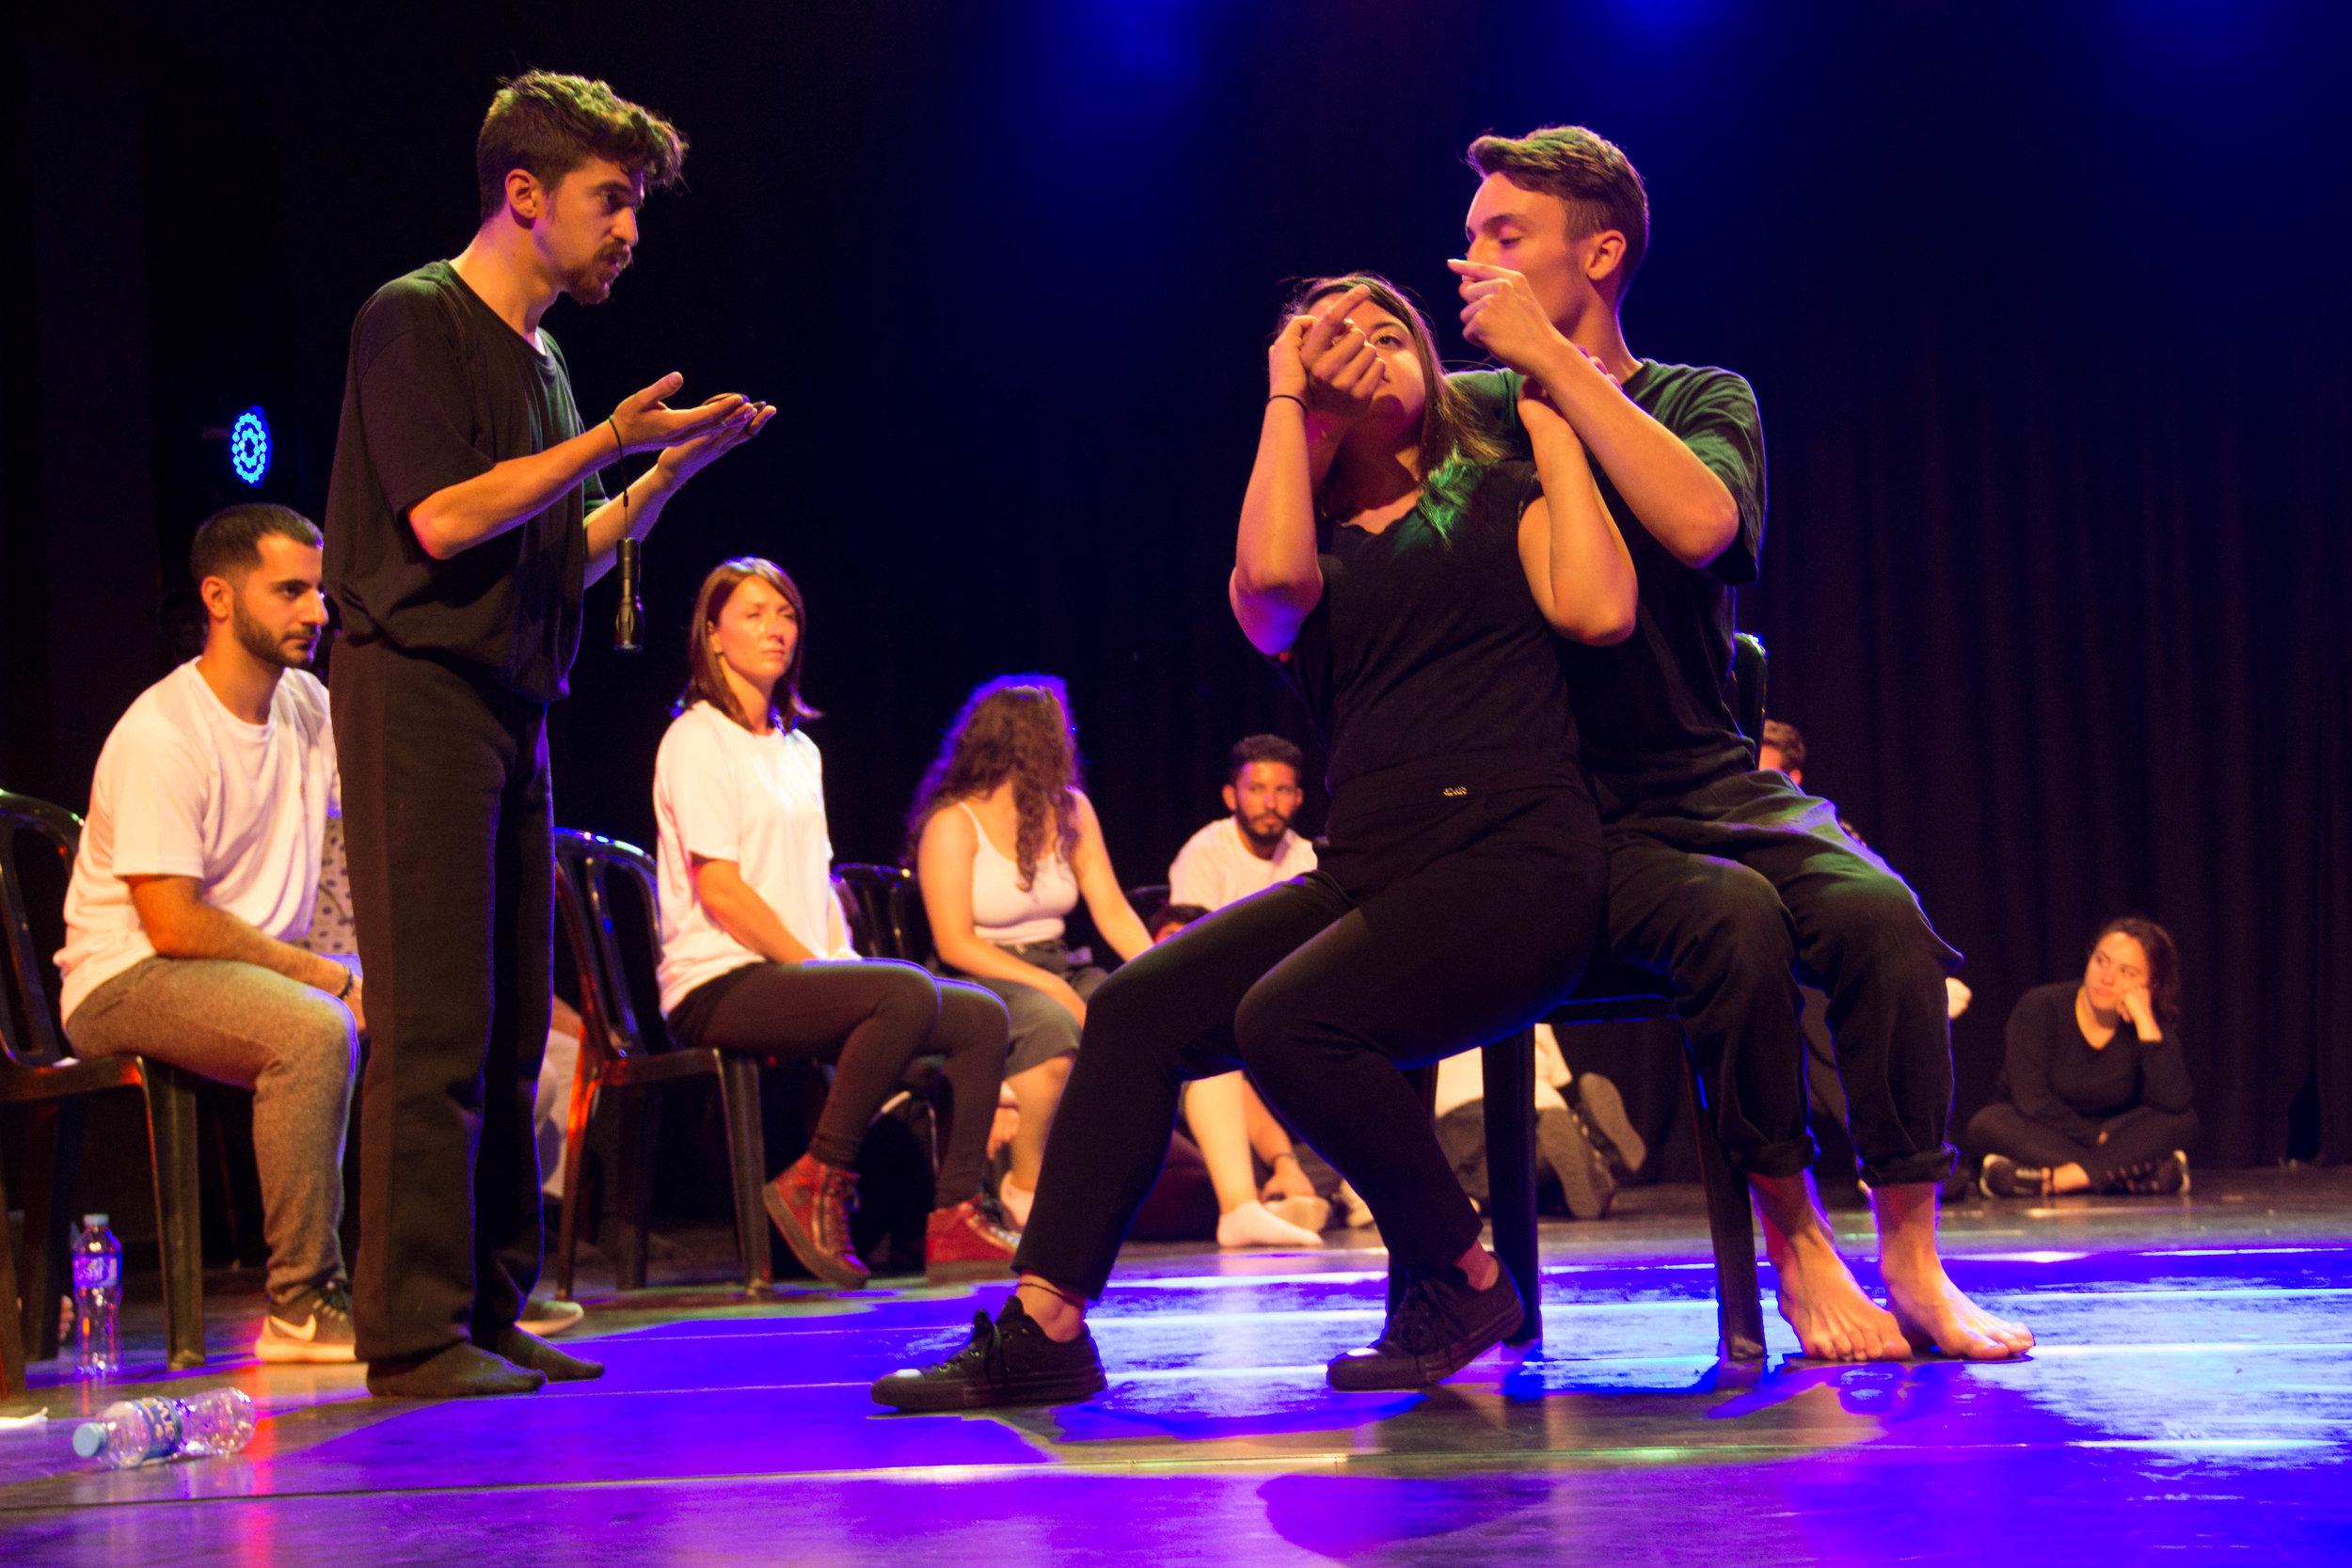 ASHTAR International Youth Theatre Festival in Ramallah